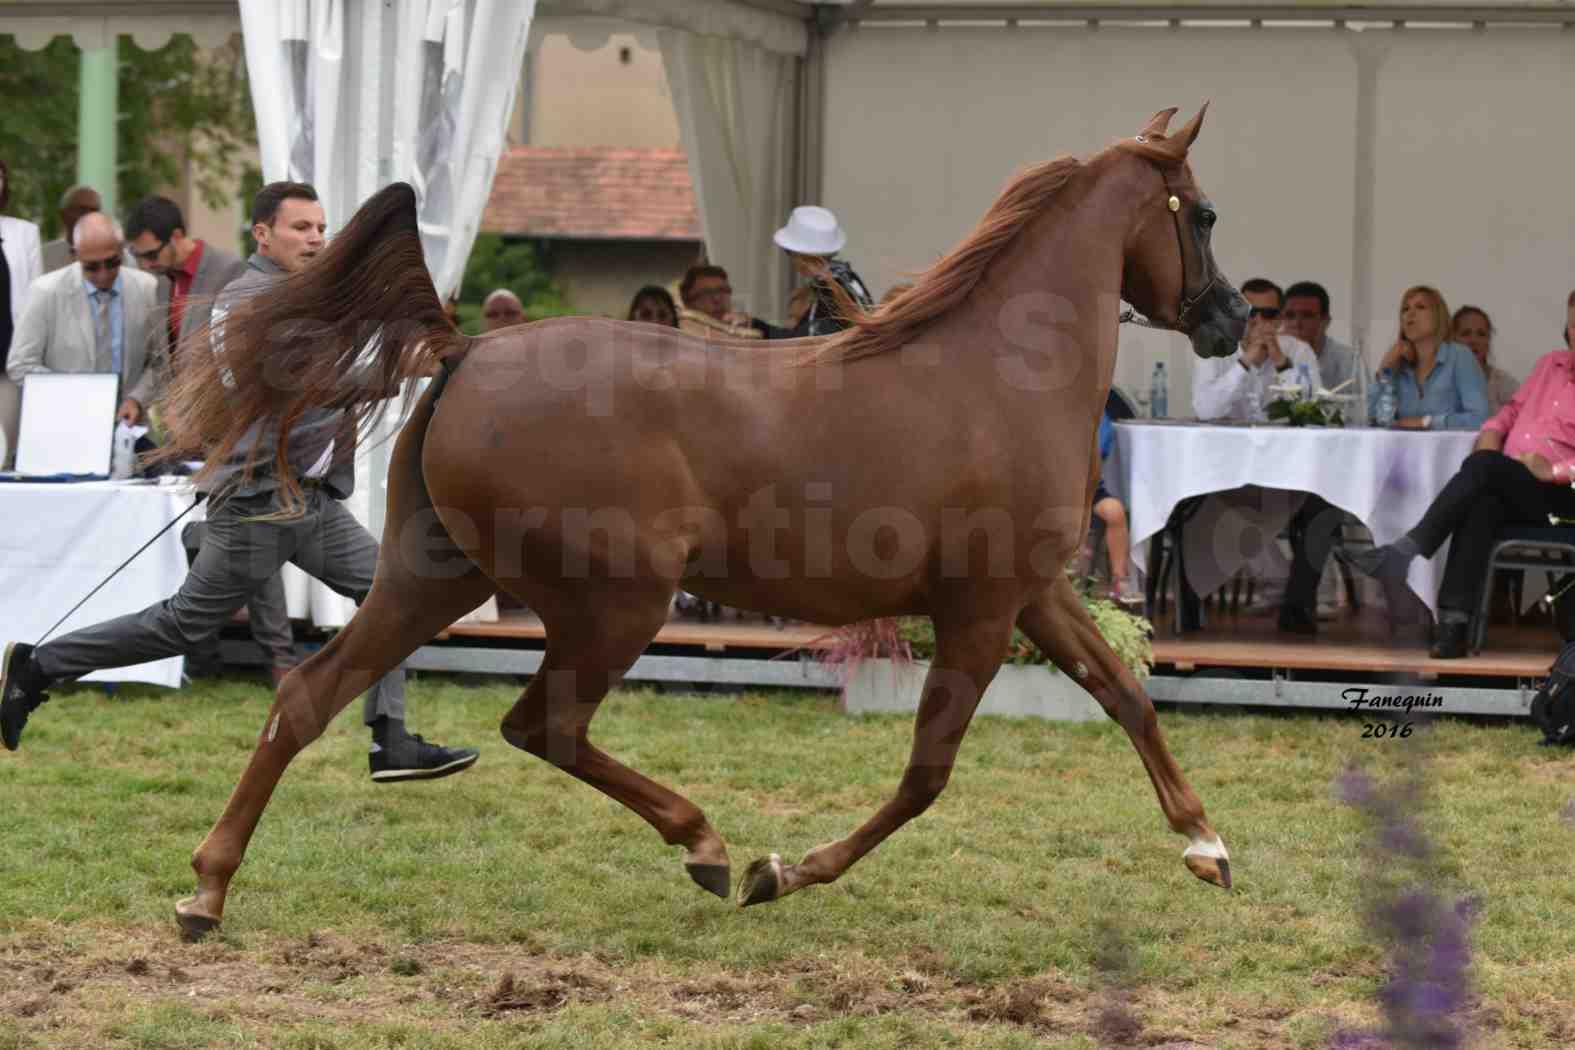 International Arabian Horse Show B de VICHY 2016 - PEARL DE DJOON - Notre Sélection - 19